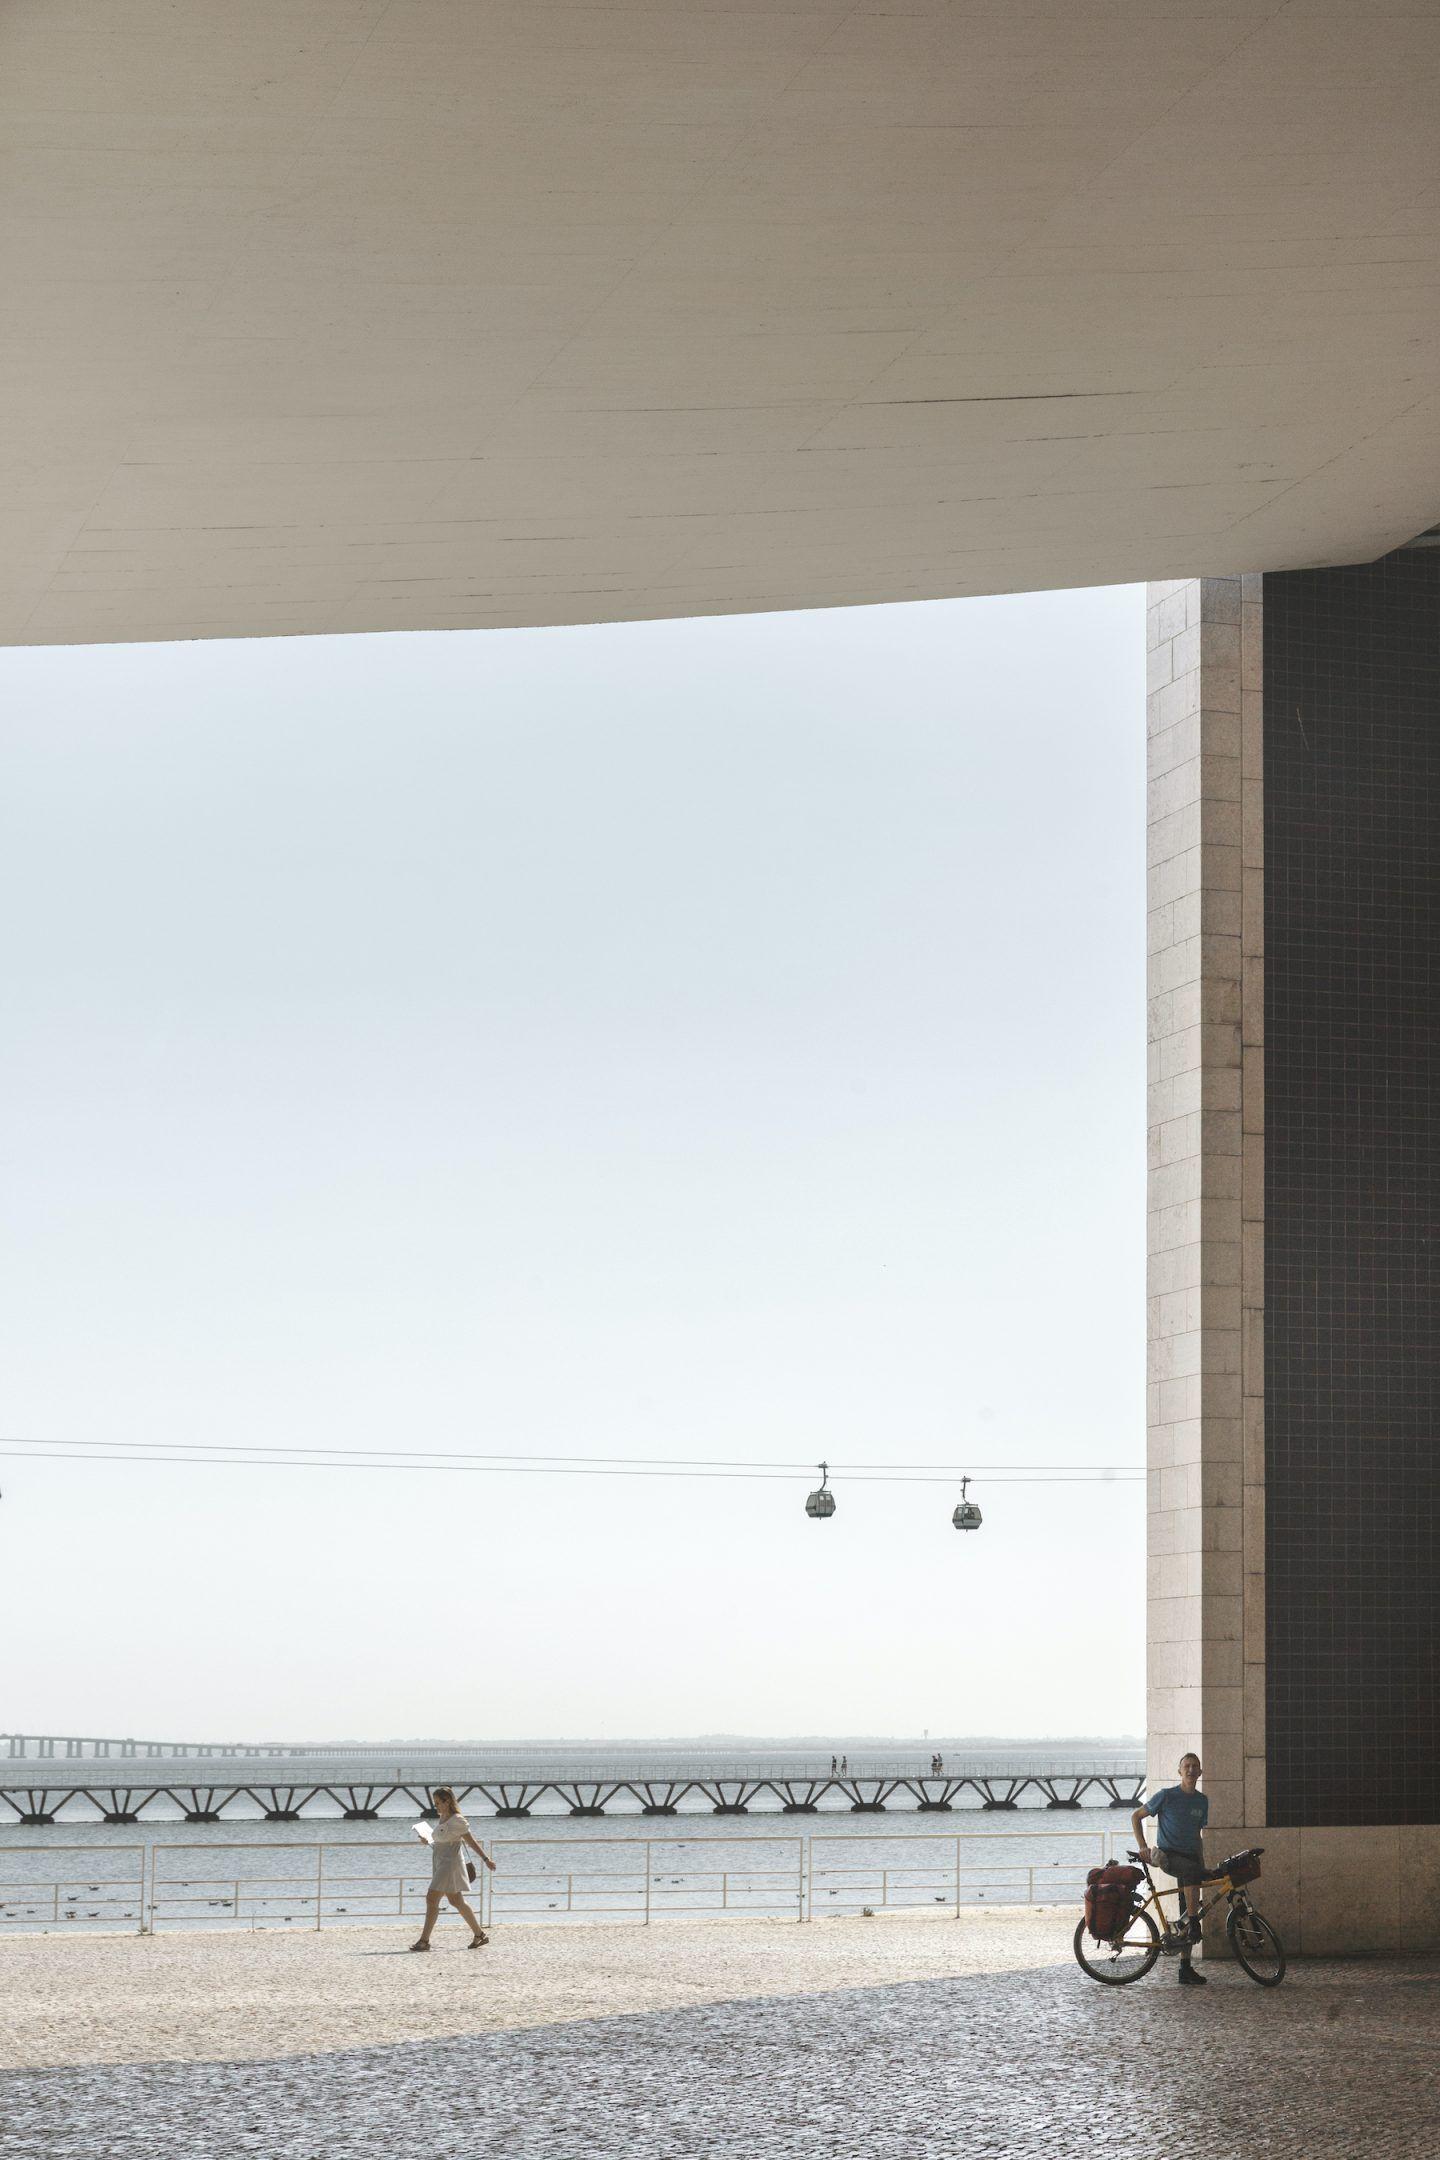 IGNANT-Architecture-Alvaro-Siza-Vieira-Portuguese-National-Pavilion-11